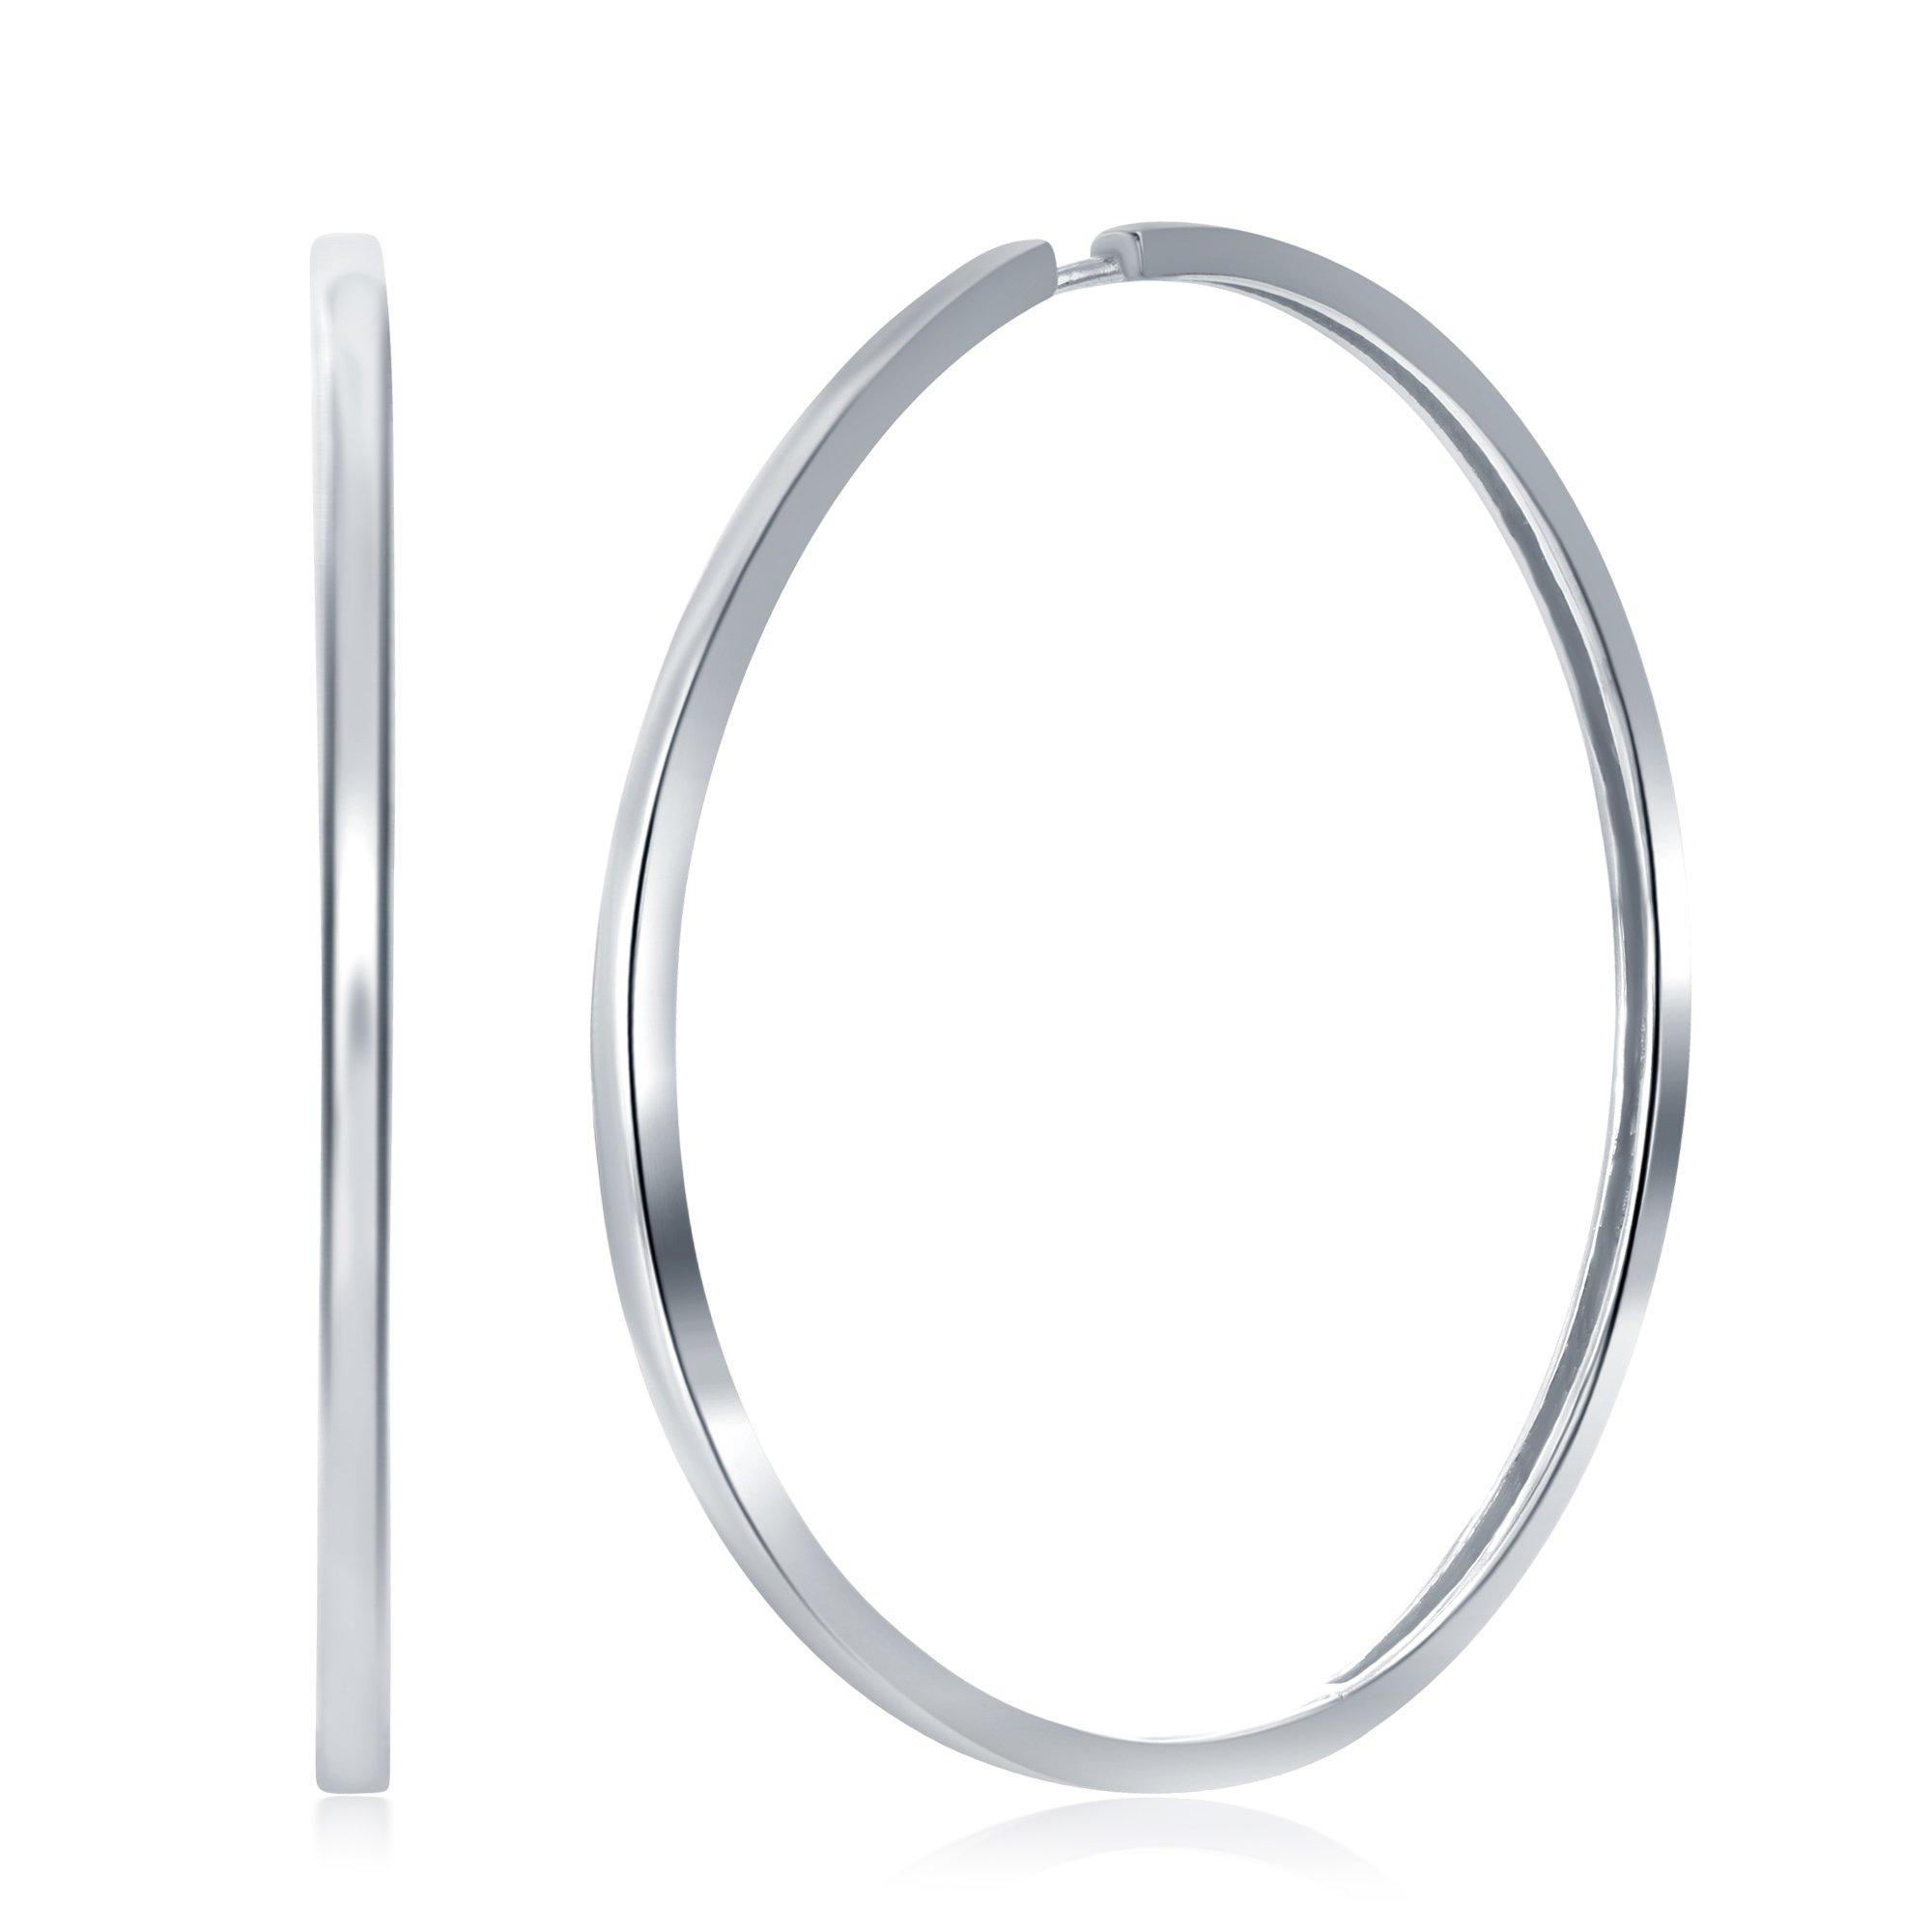 925 Sterling Silver Hoop Earrings for Women Girls Earrings Rounded Huggies for Men (60mm Silver)